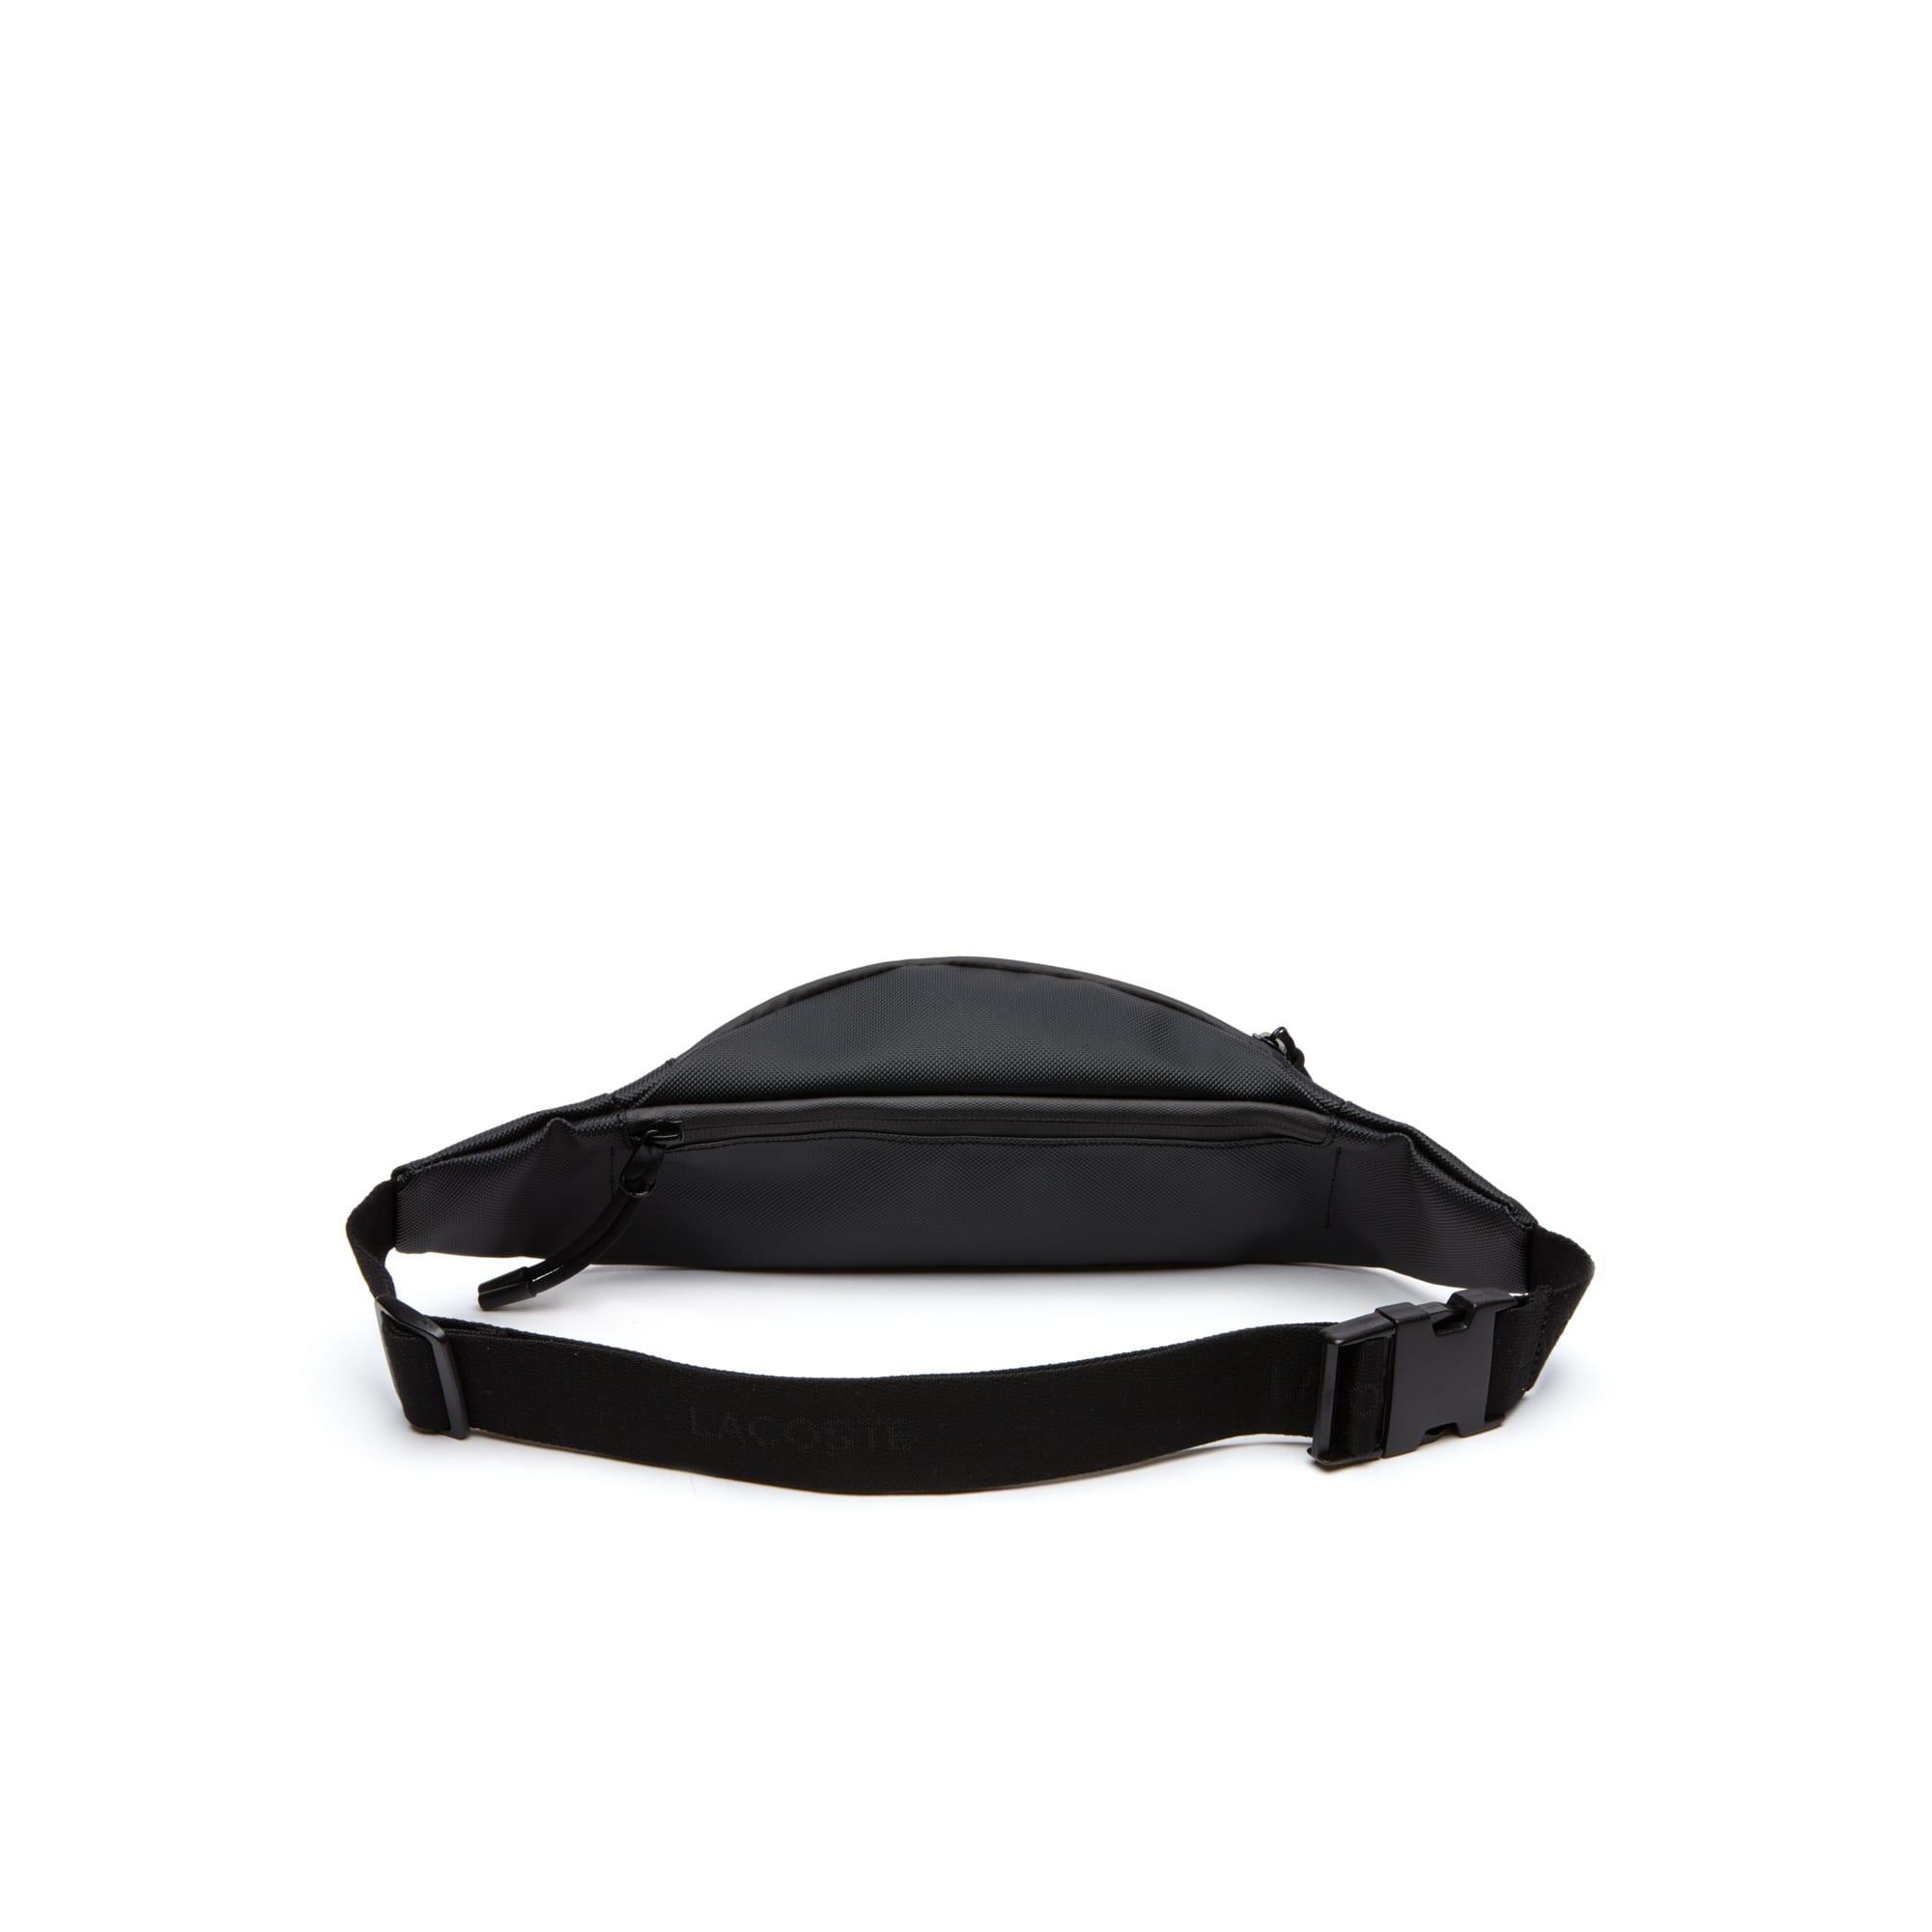 Details about  /Leaper Tote backpack LE9012P2BK black 4WAY JAPAN